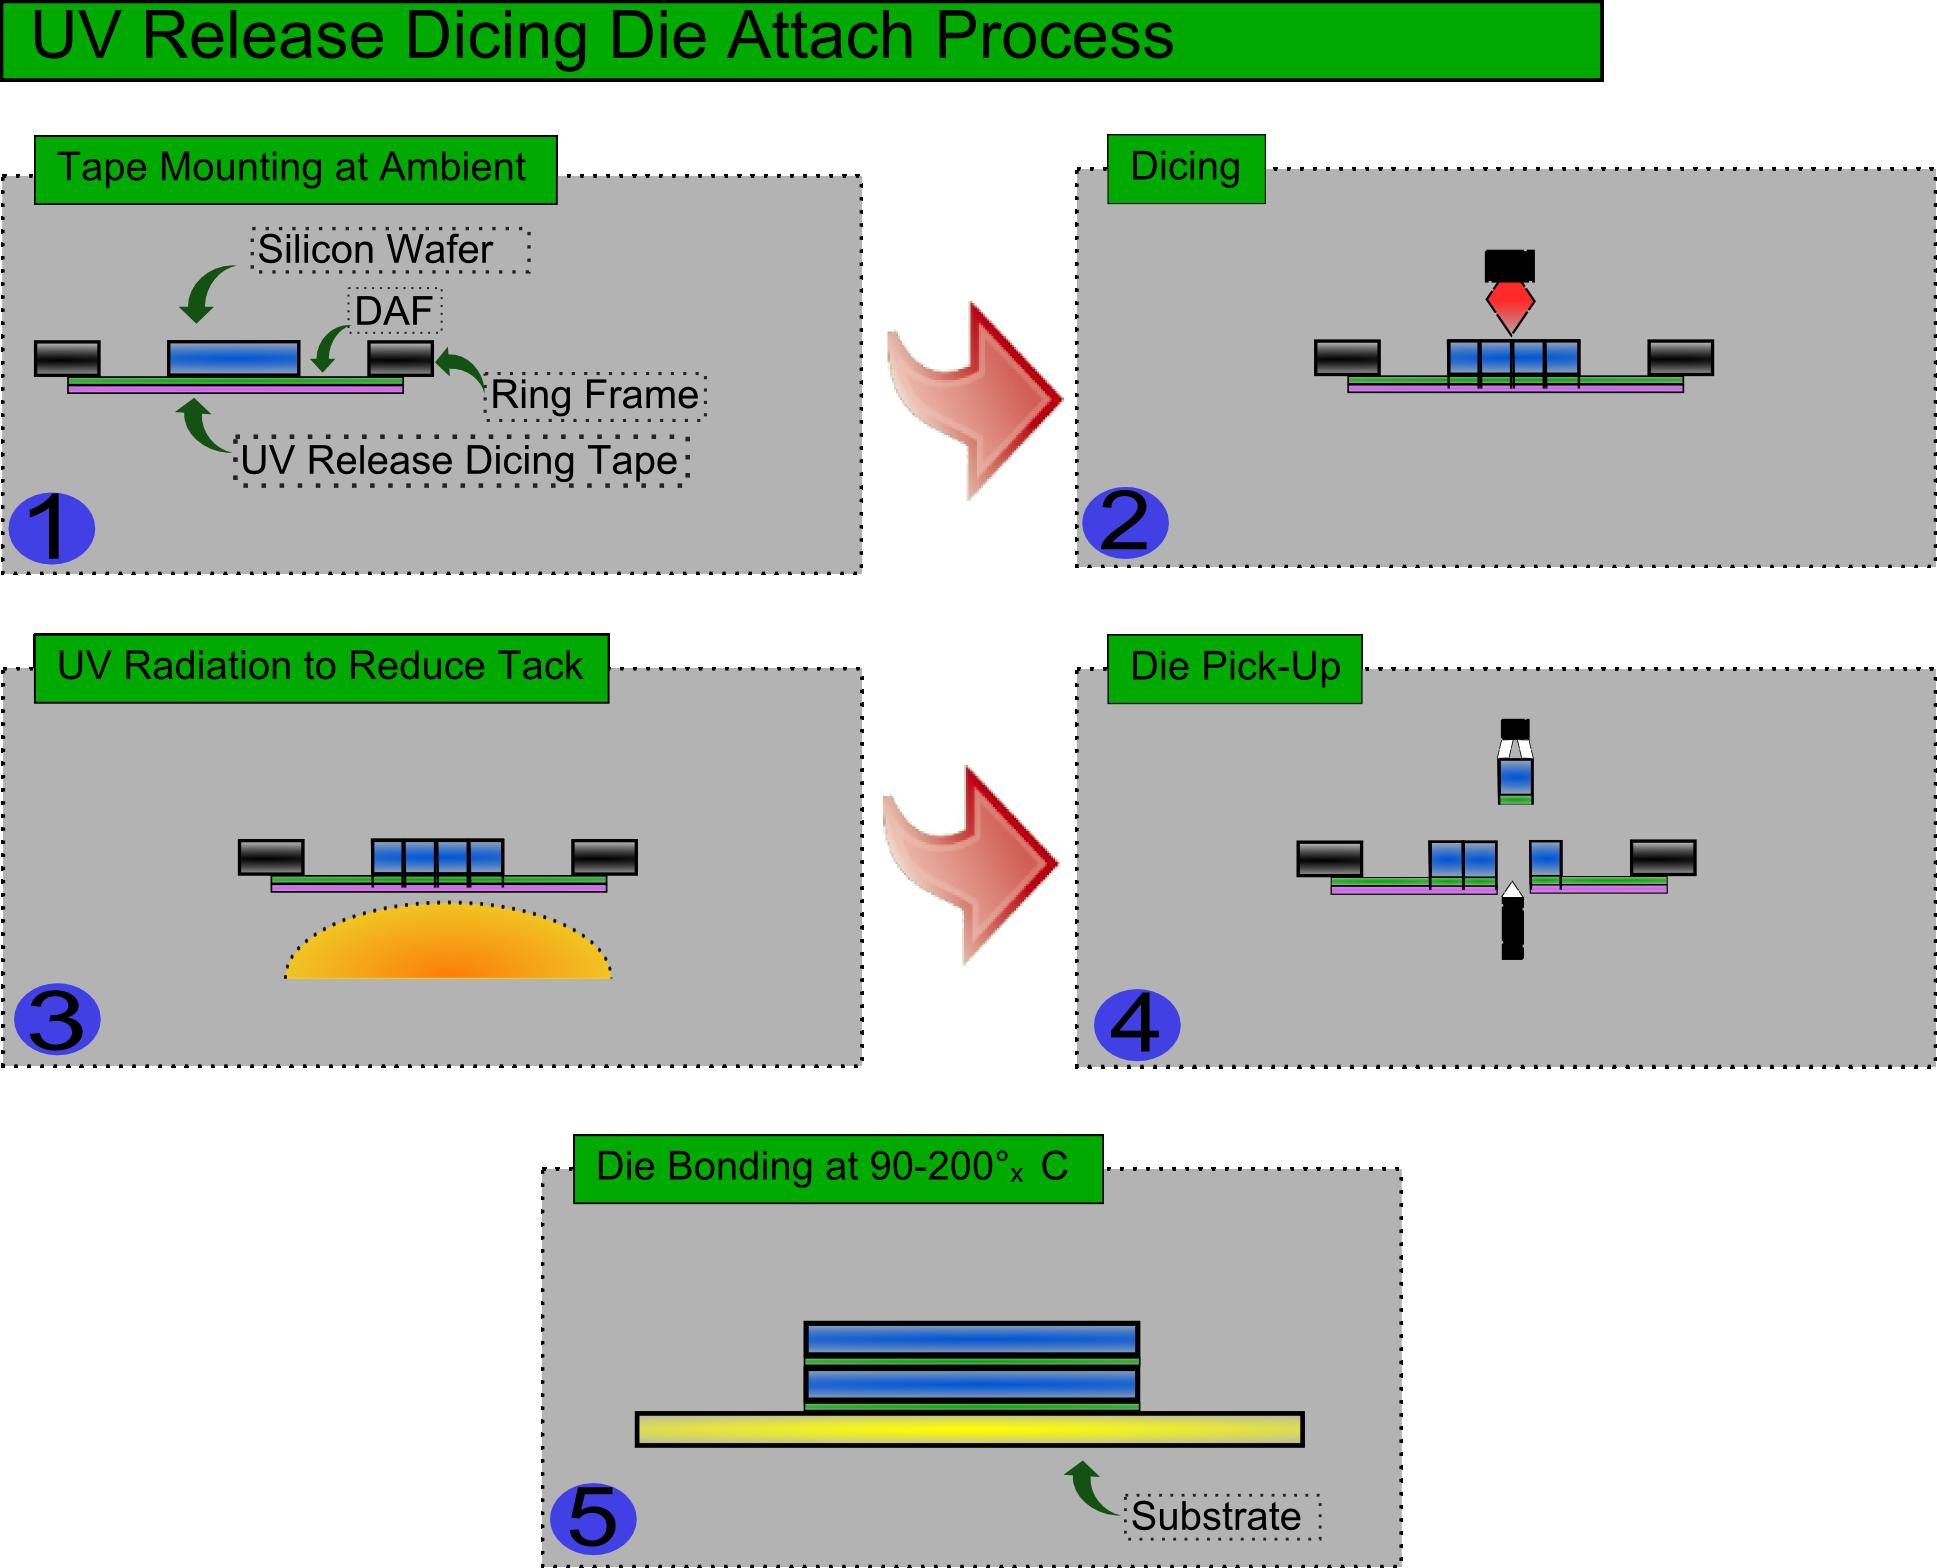 UV Release Dicing Die Attach